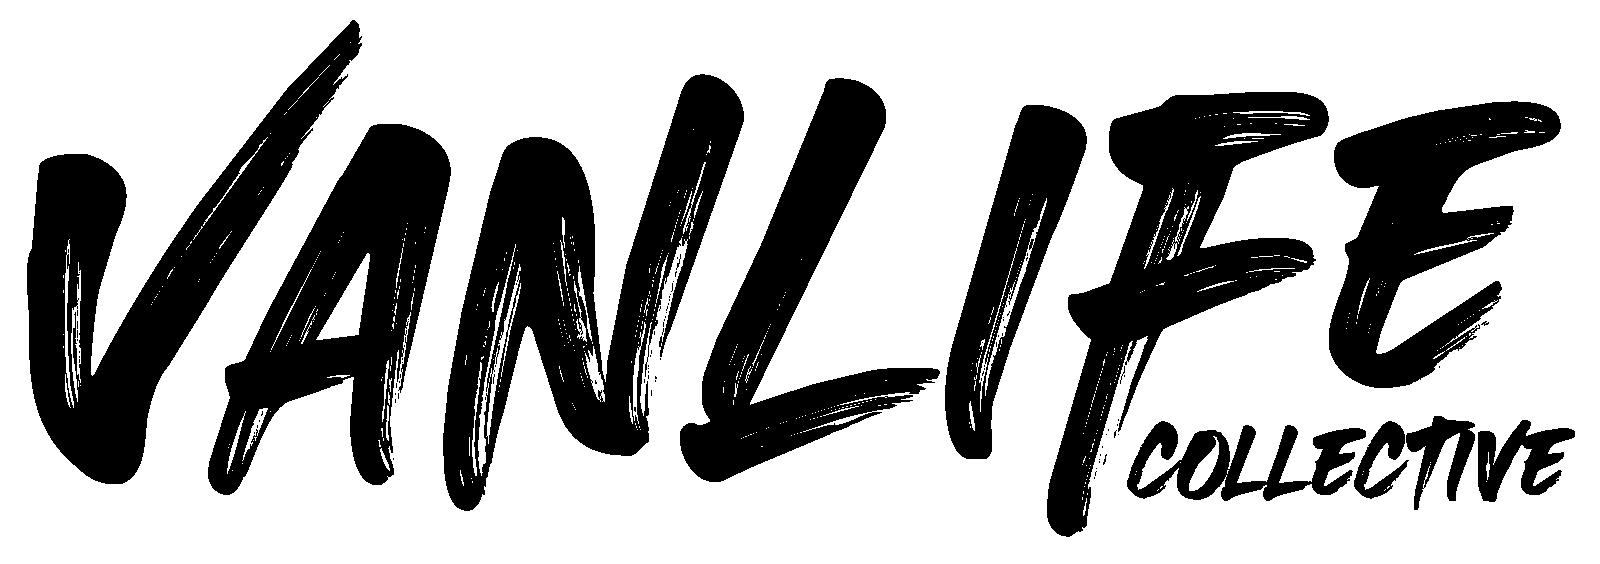 VanLife-Collective-logo